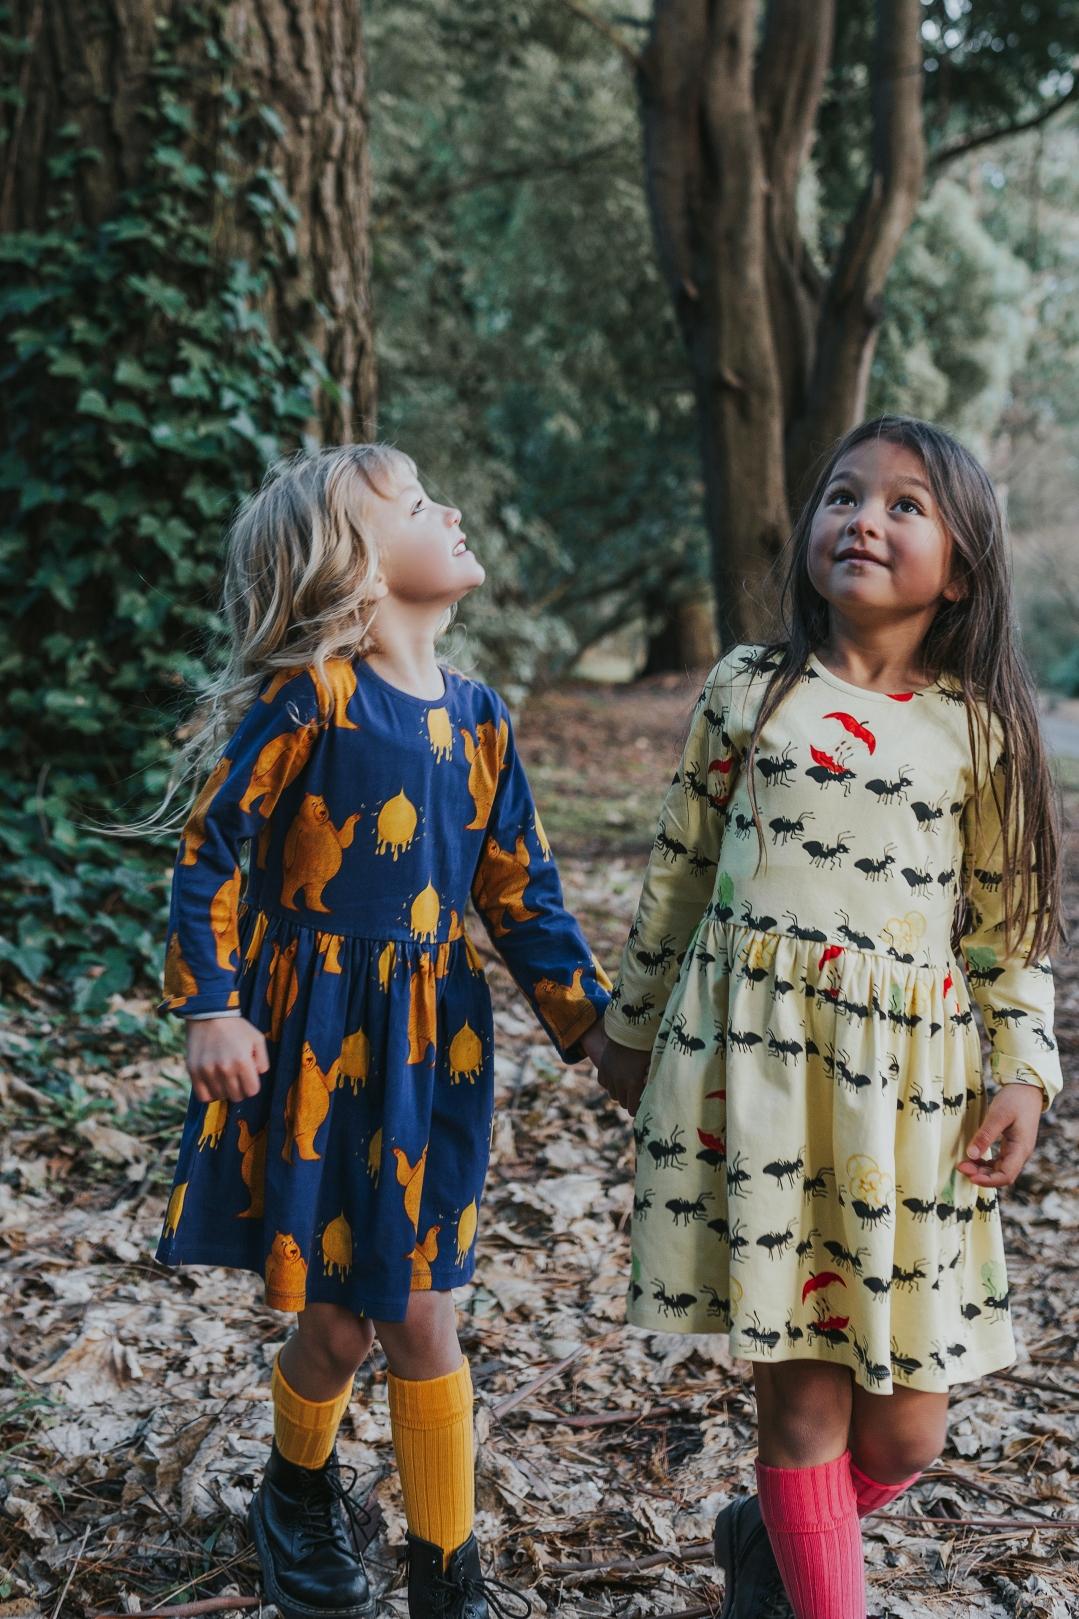 girls-walk-forest-commercial-photographer-siida-tasmania.jpg